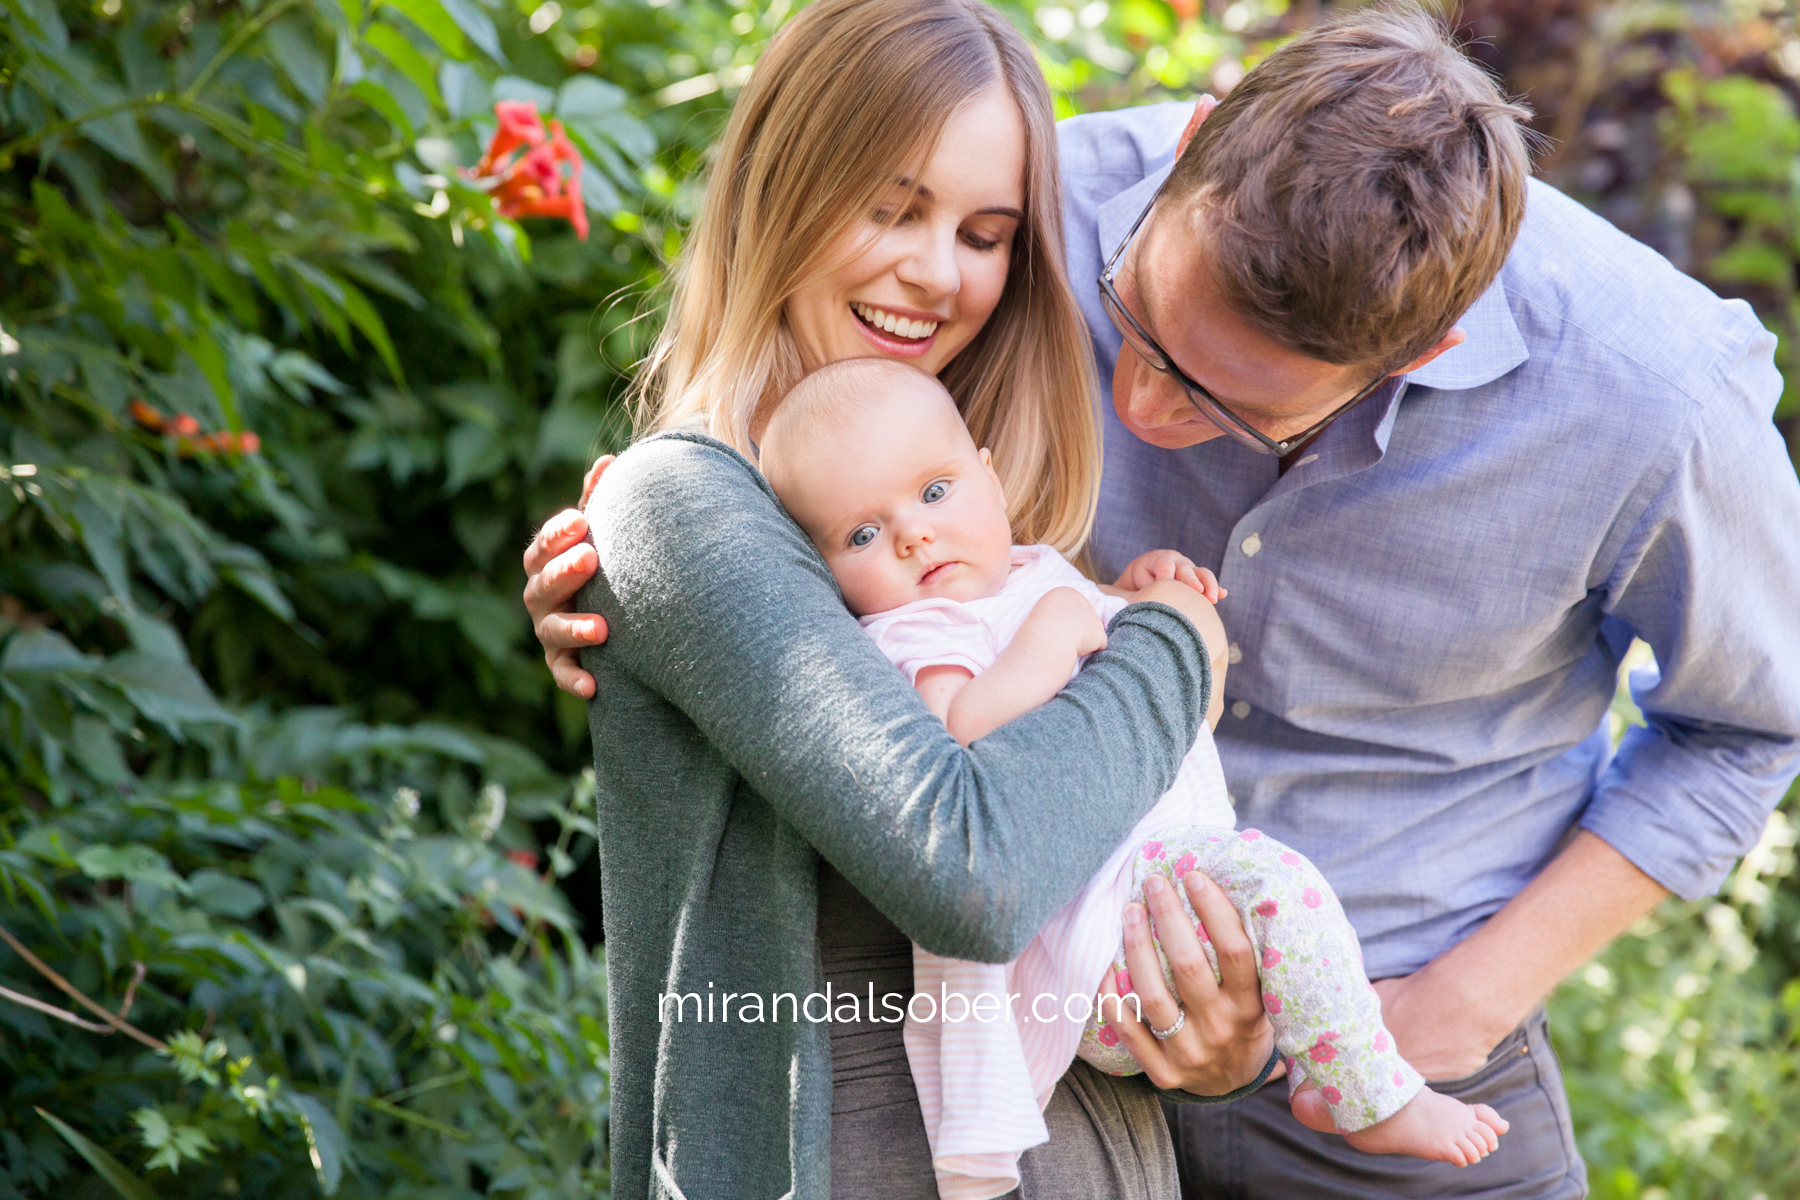 Boulder baby photographers, Miranda L. Sober Photography